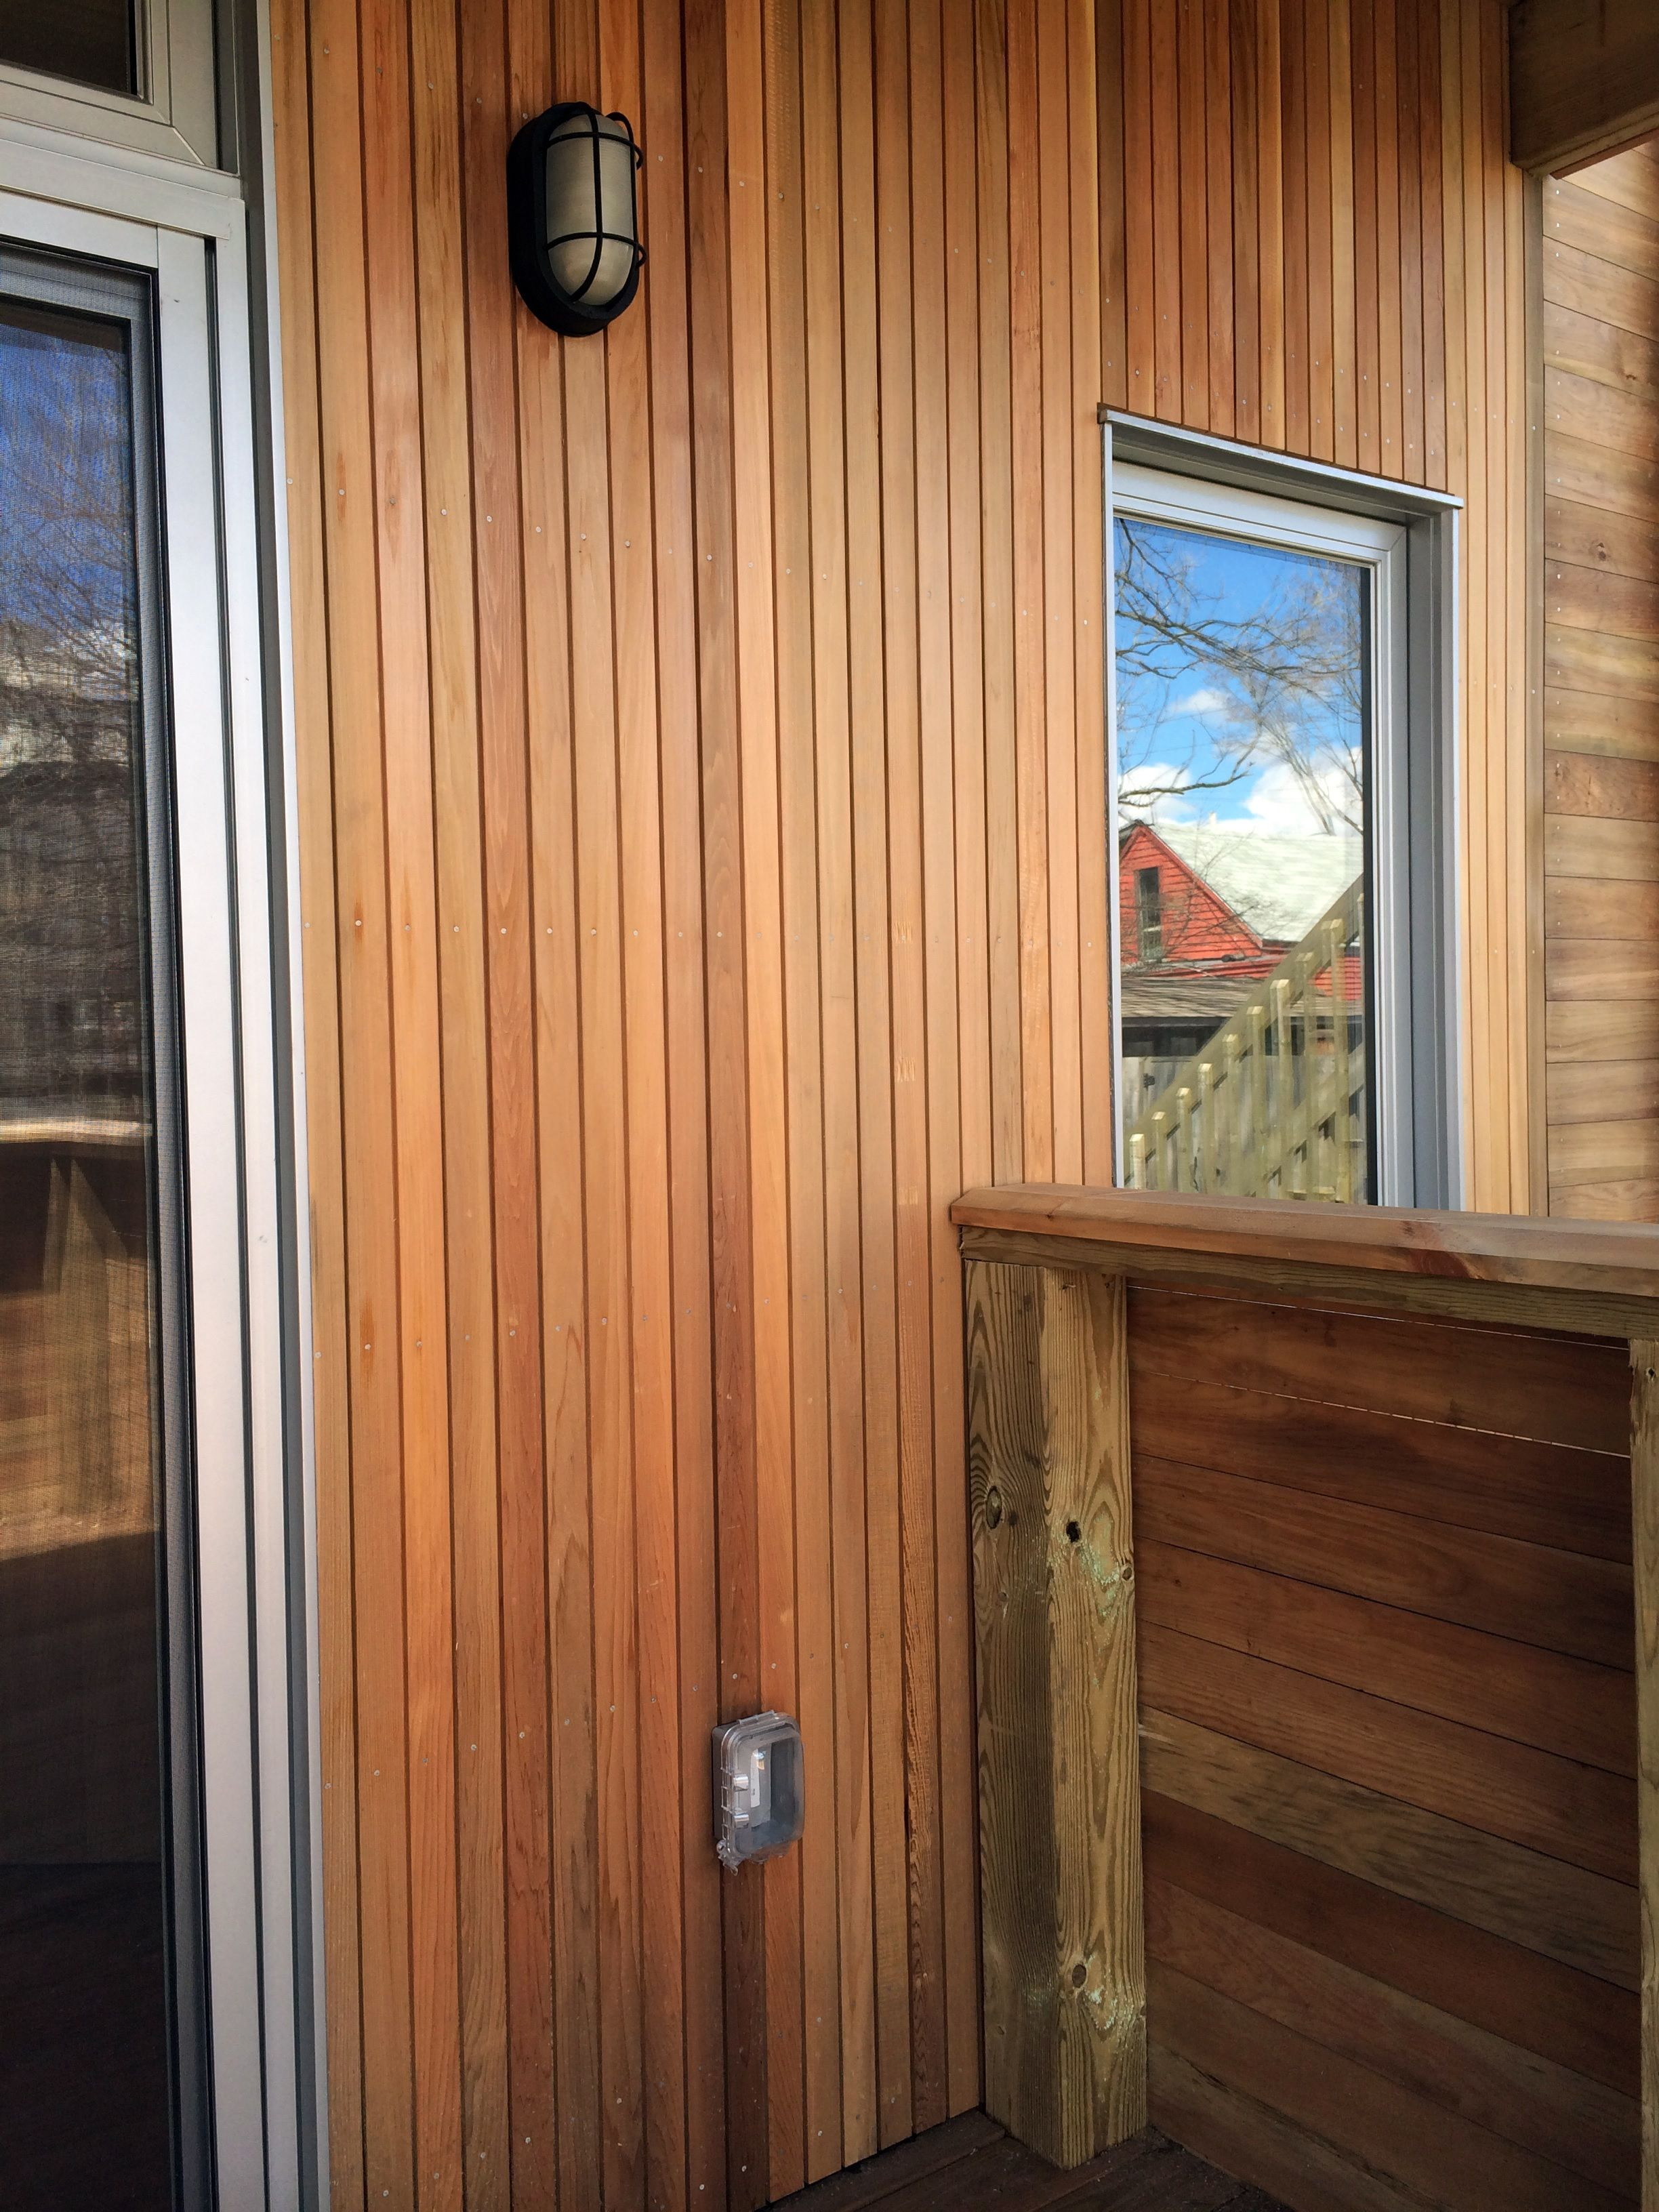 Exterior Design Lap Cedar Siding Shiplap Wood Shiplap Siding Shiplap Siding Cedar Siding Shiplap Wood